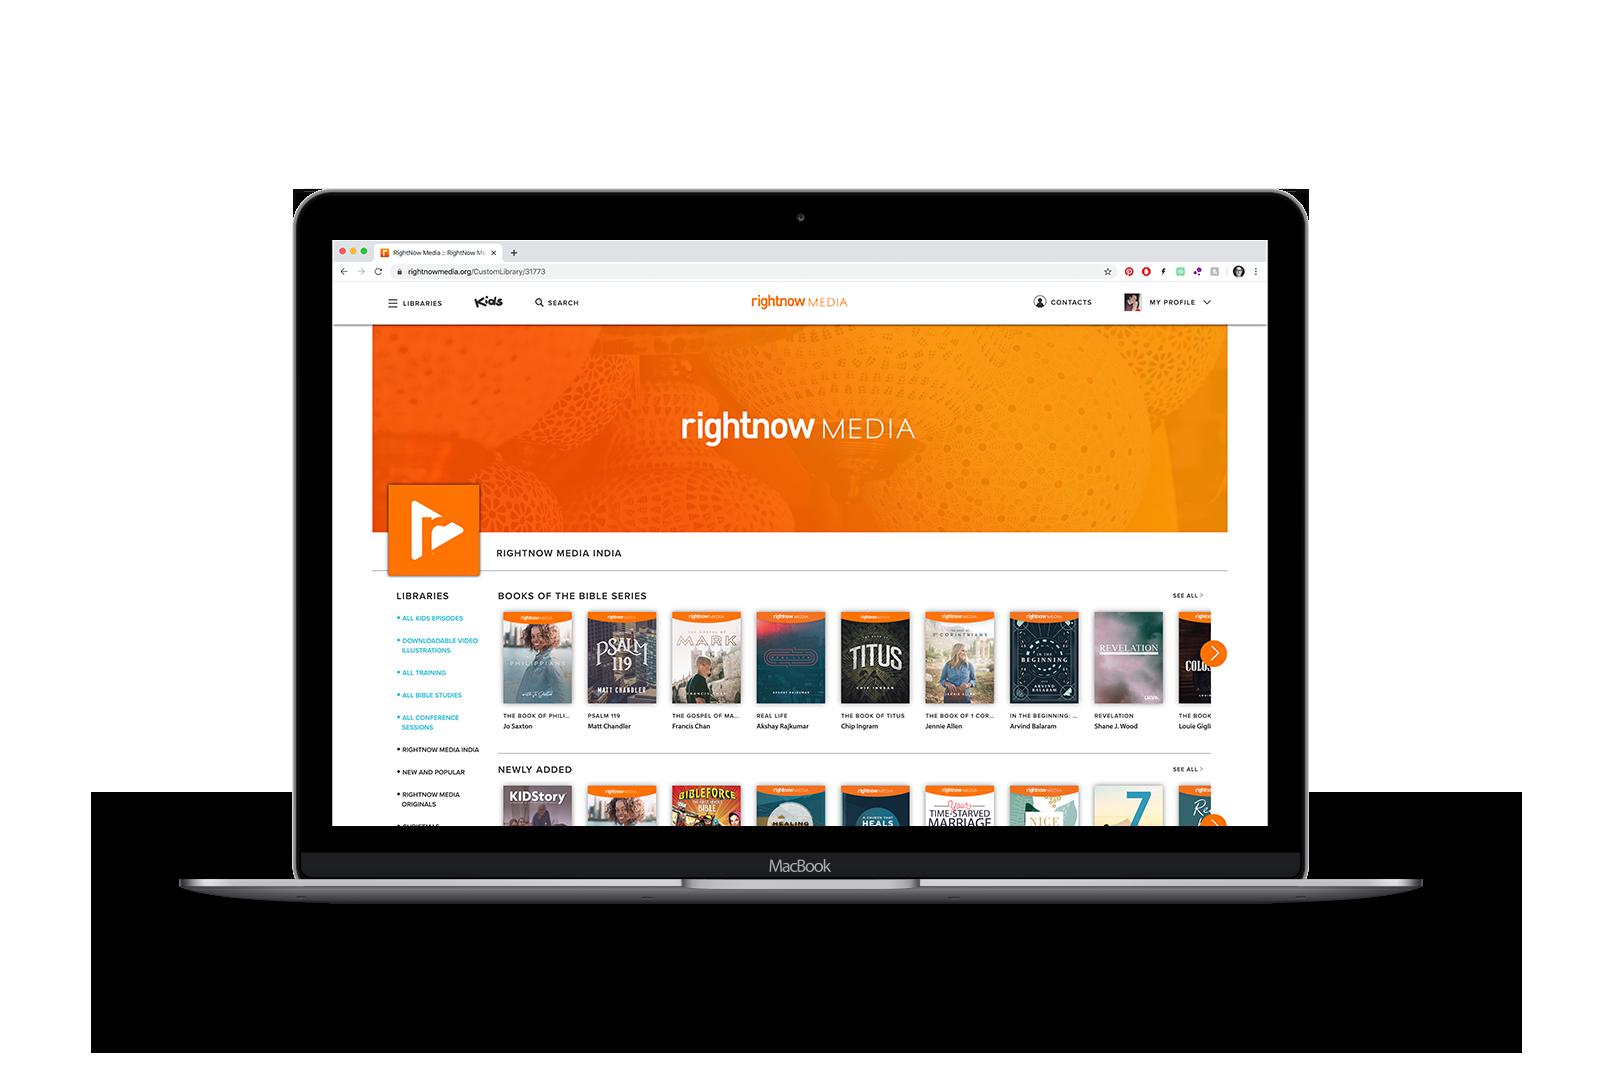 RightNow Media India Platform